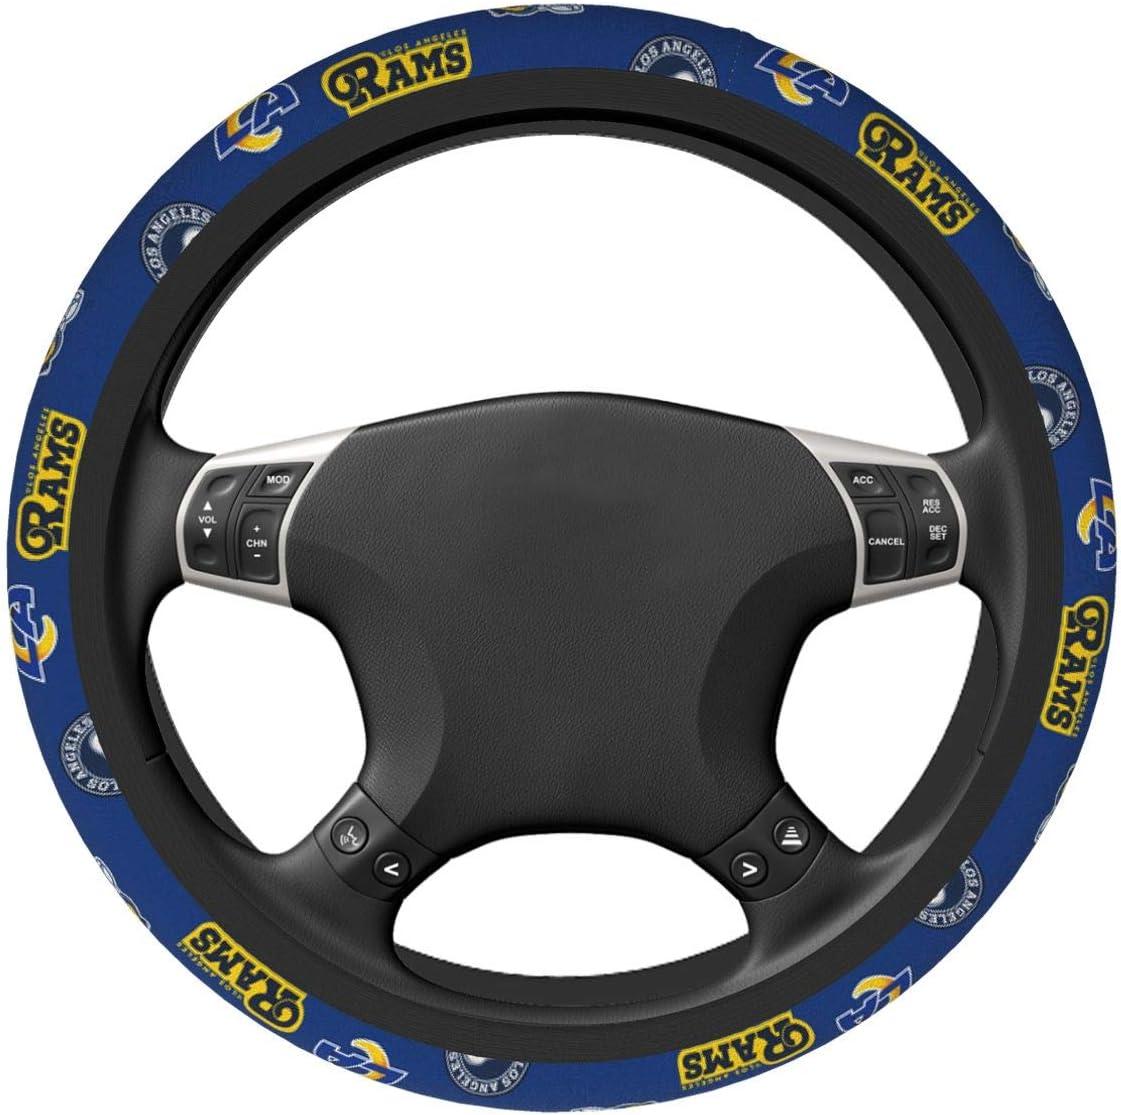 Cramnrgt Pittsburgh Football Team Fans Steering Wheel Cover Universal 15 Inch Anti-Slip Neoprene Automotive Steering Wheel Cover